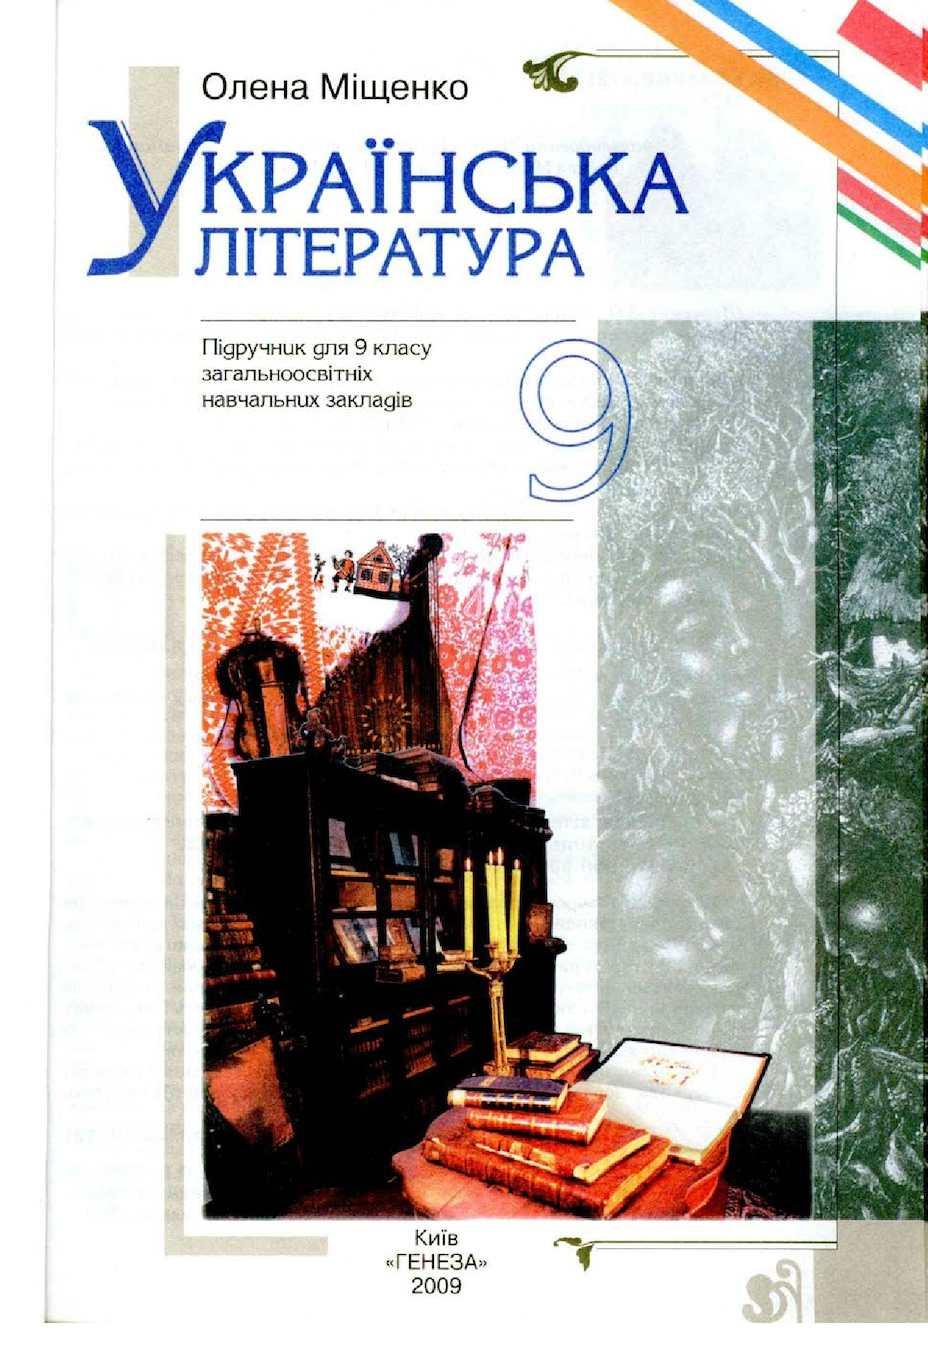 Calaméo - 9 клас Міщенко Українська література 2009 d9d4247c1a85e